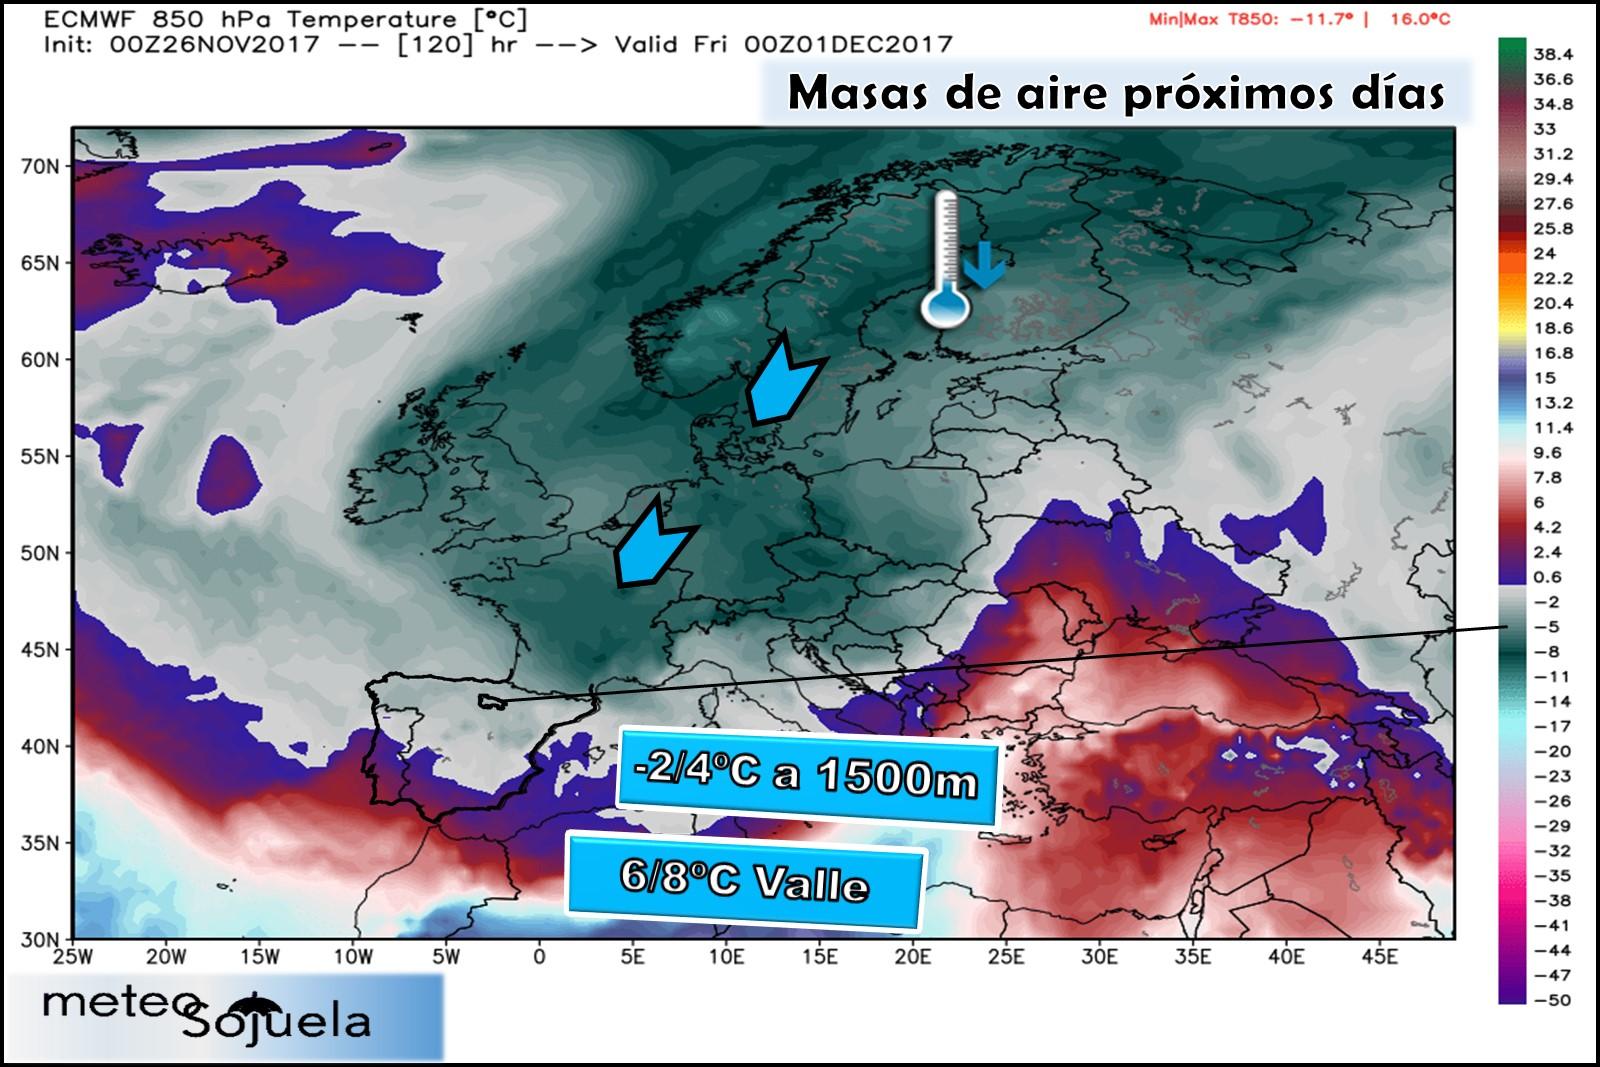 frio, masa ,masa aire,850,850hPa,tiempo.larioja,josecalvo,meteosojuela